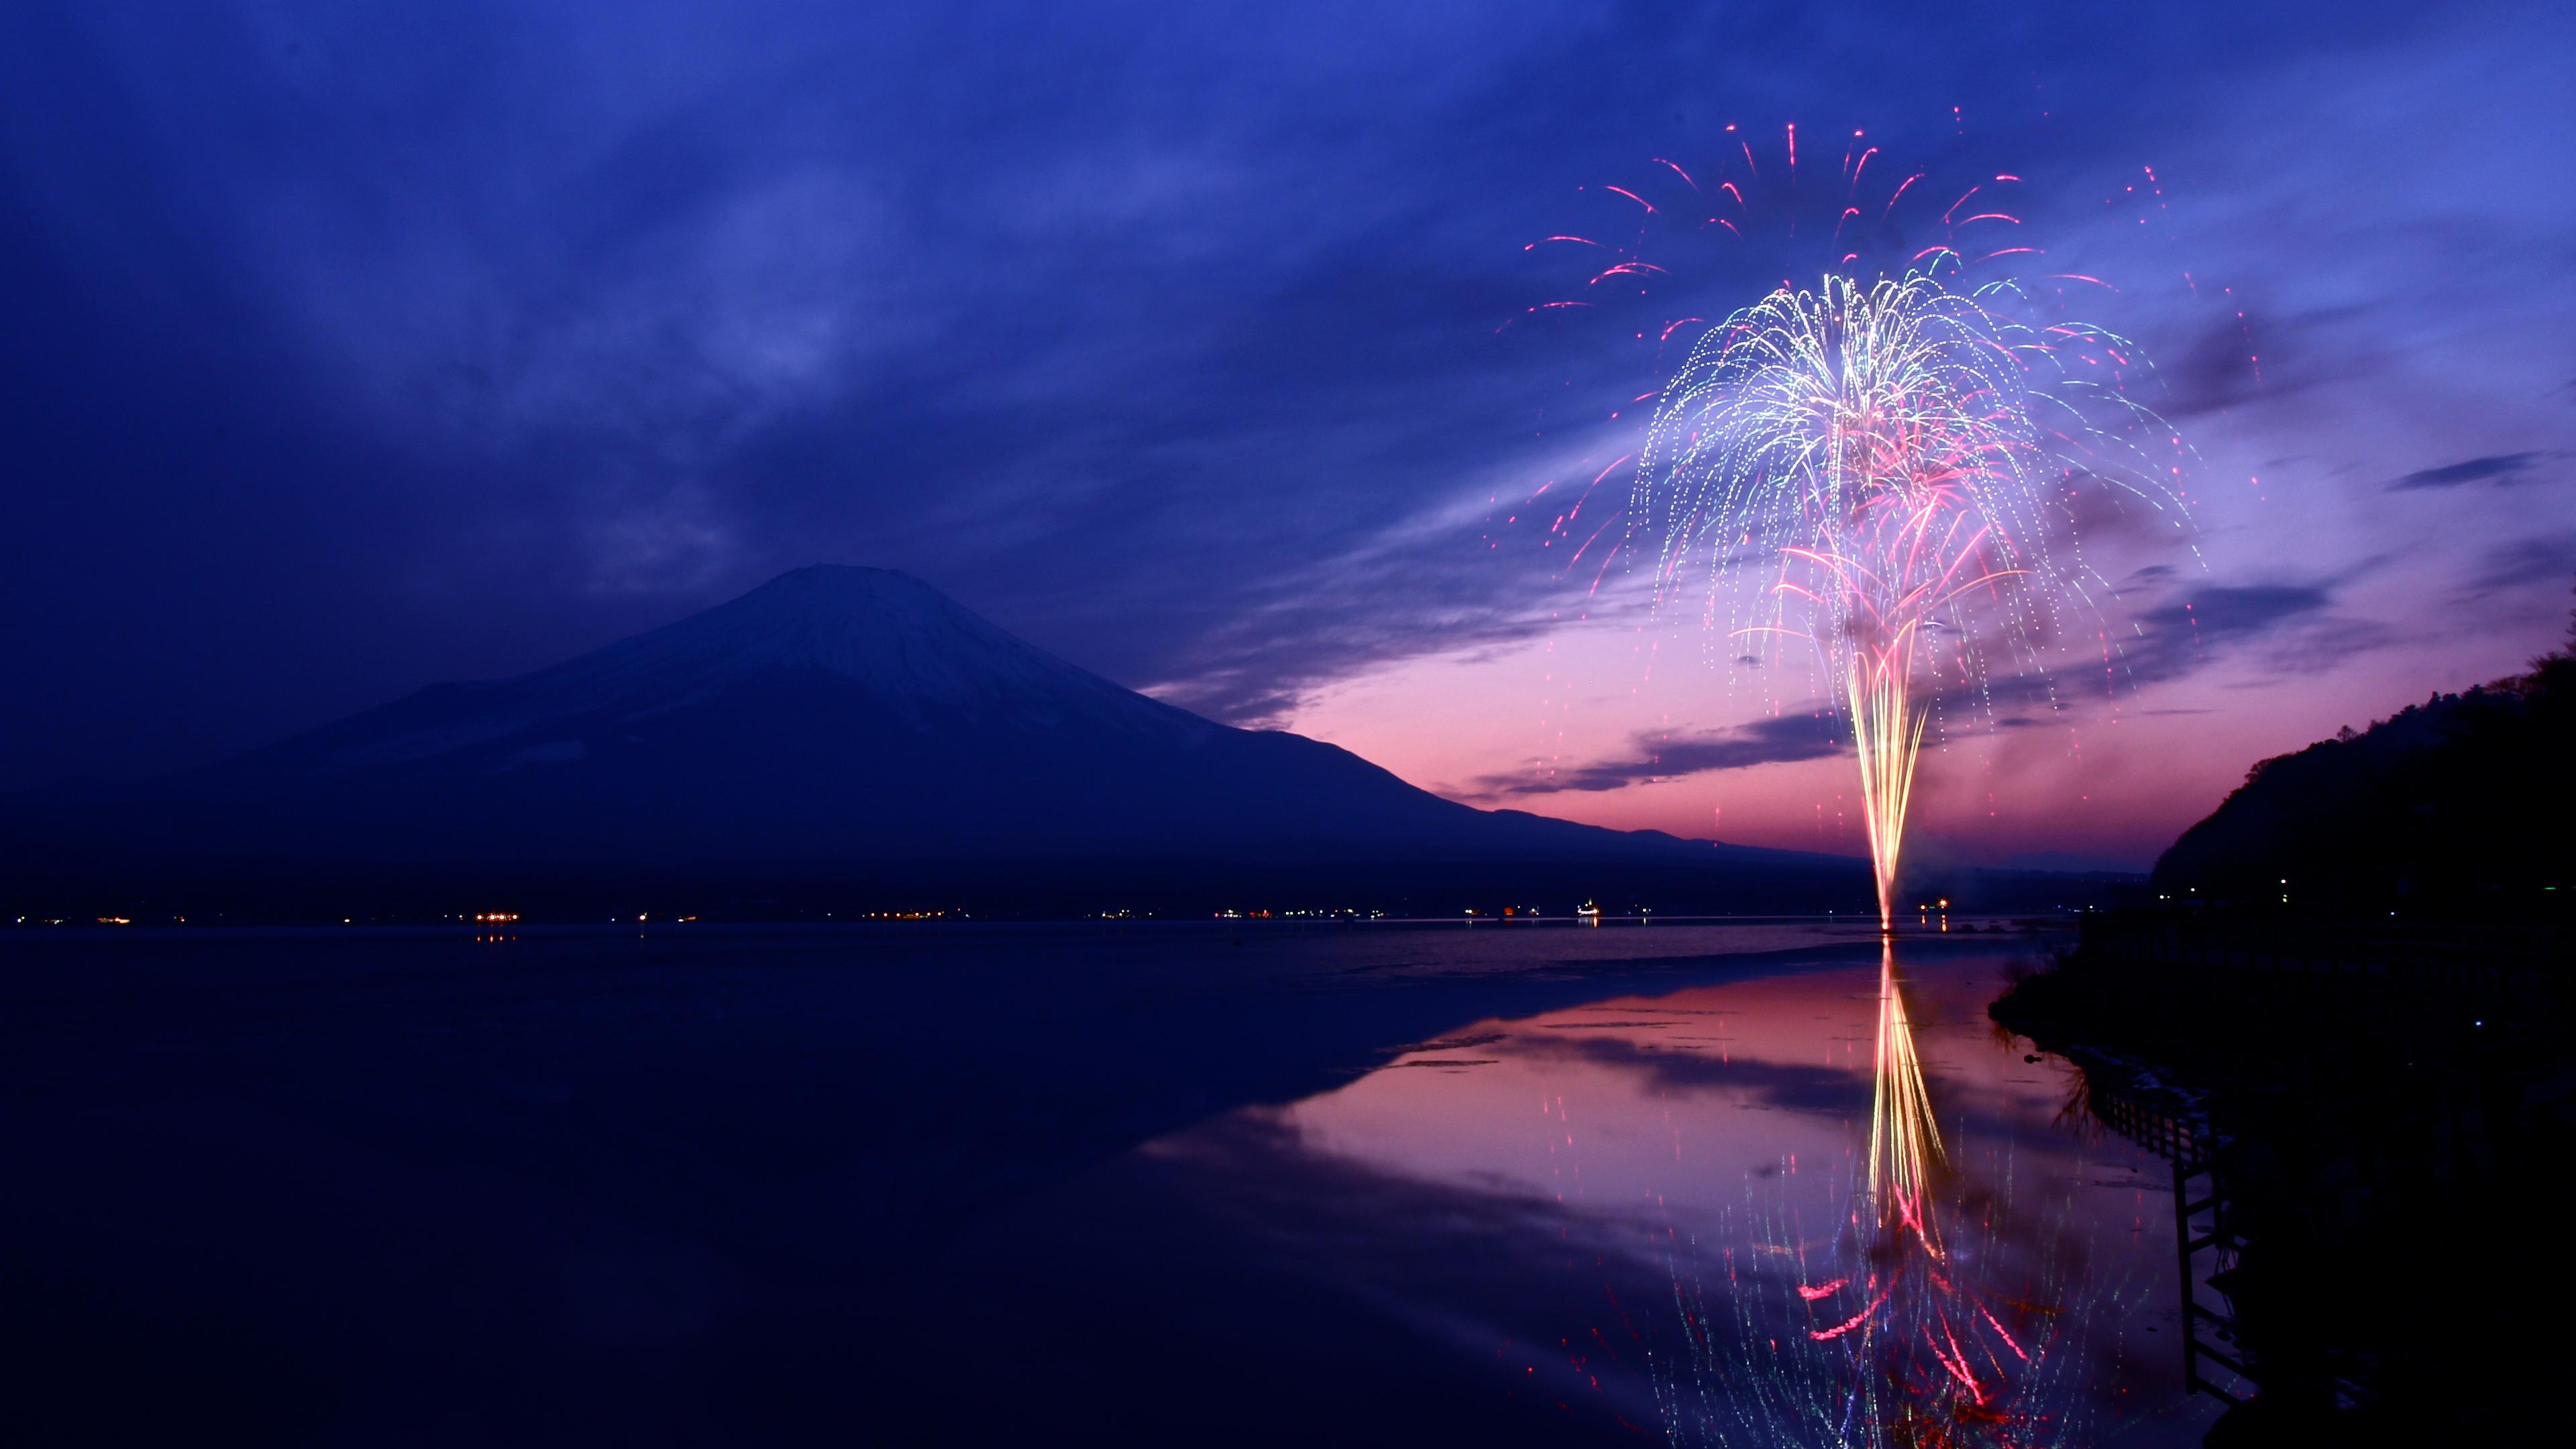 Wallpaper 4k Mount Fuji Fireworks Japan 4k 4k Wallpapers Hd